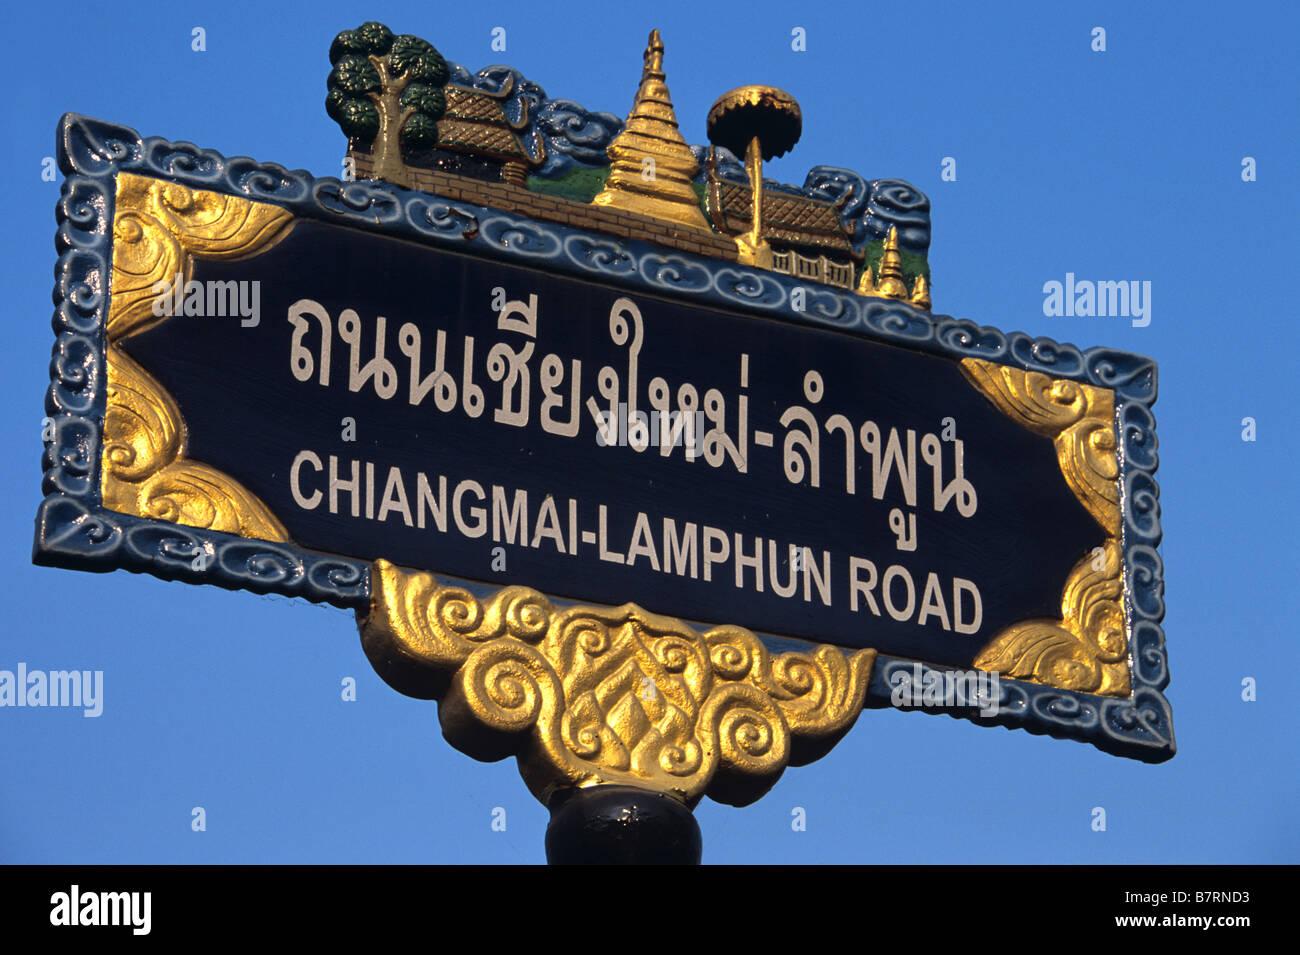 Bilingual Street Sign, Chiang Mai - Lumphun Road, Chiang Mai, Written in Thai Alphabet & English Roman Script, - Stock Image